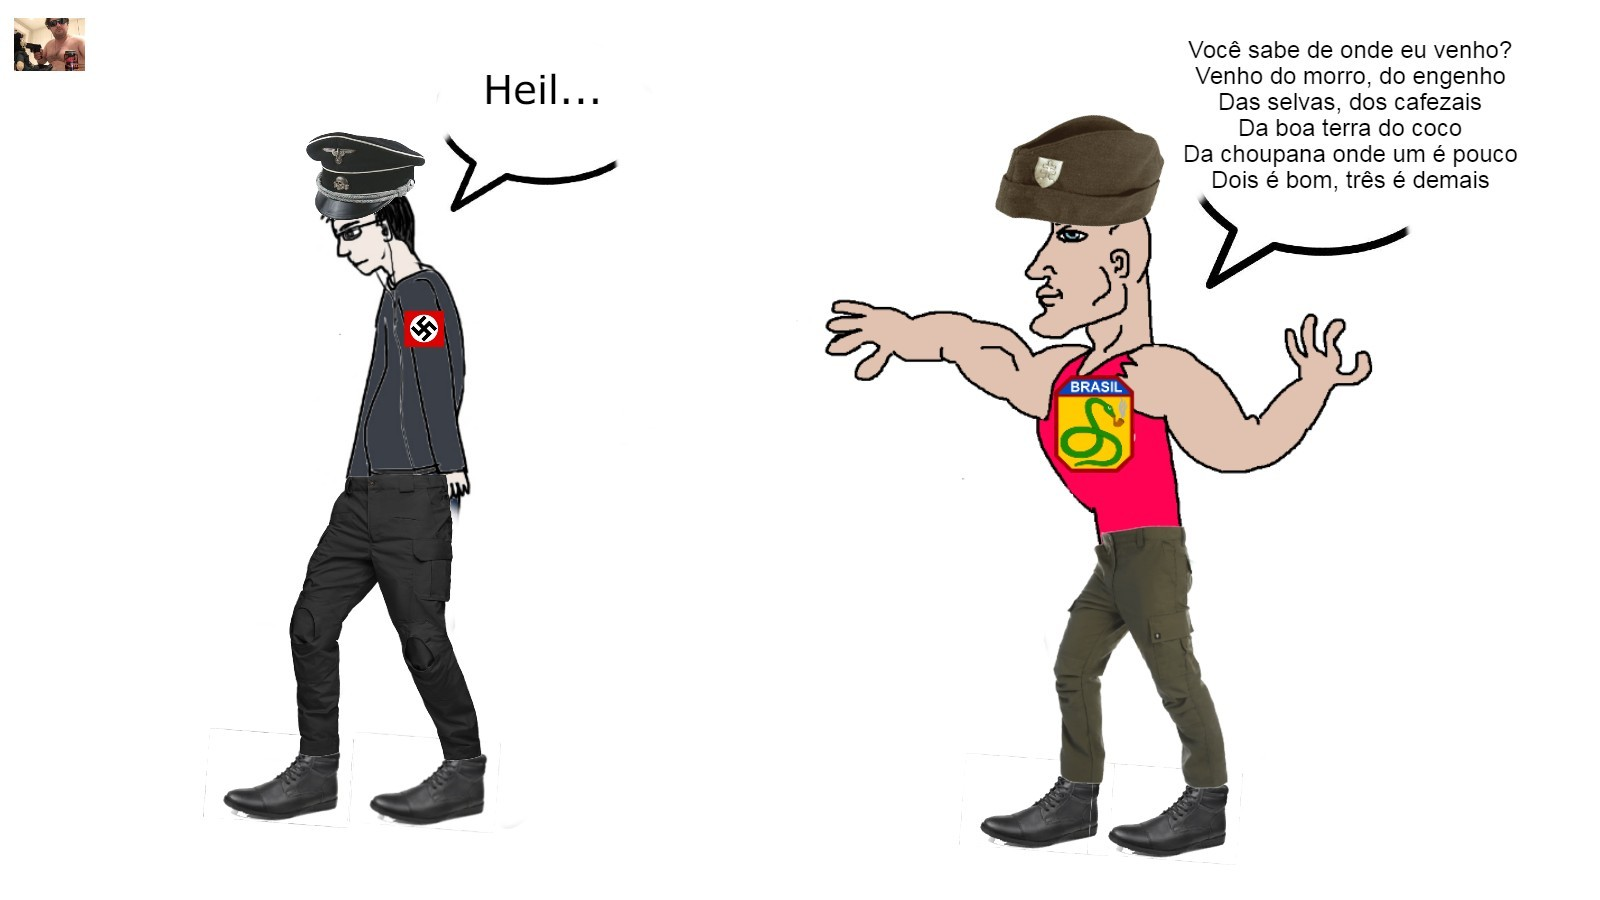 Chad FEB, Virgin Nazis [Original Choris] - meme